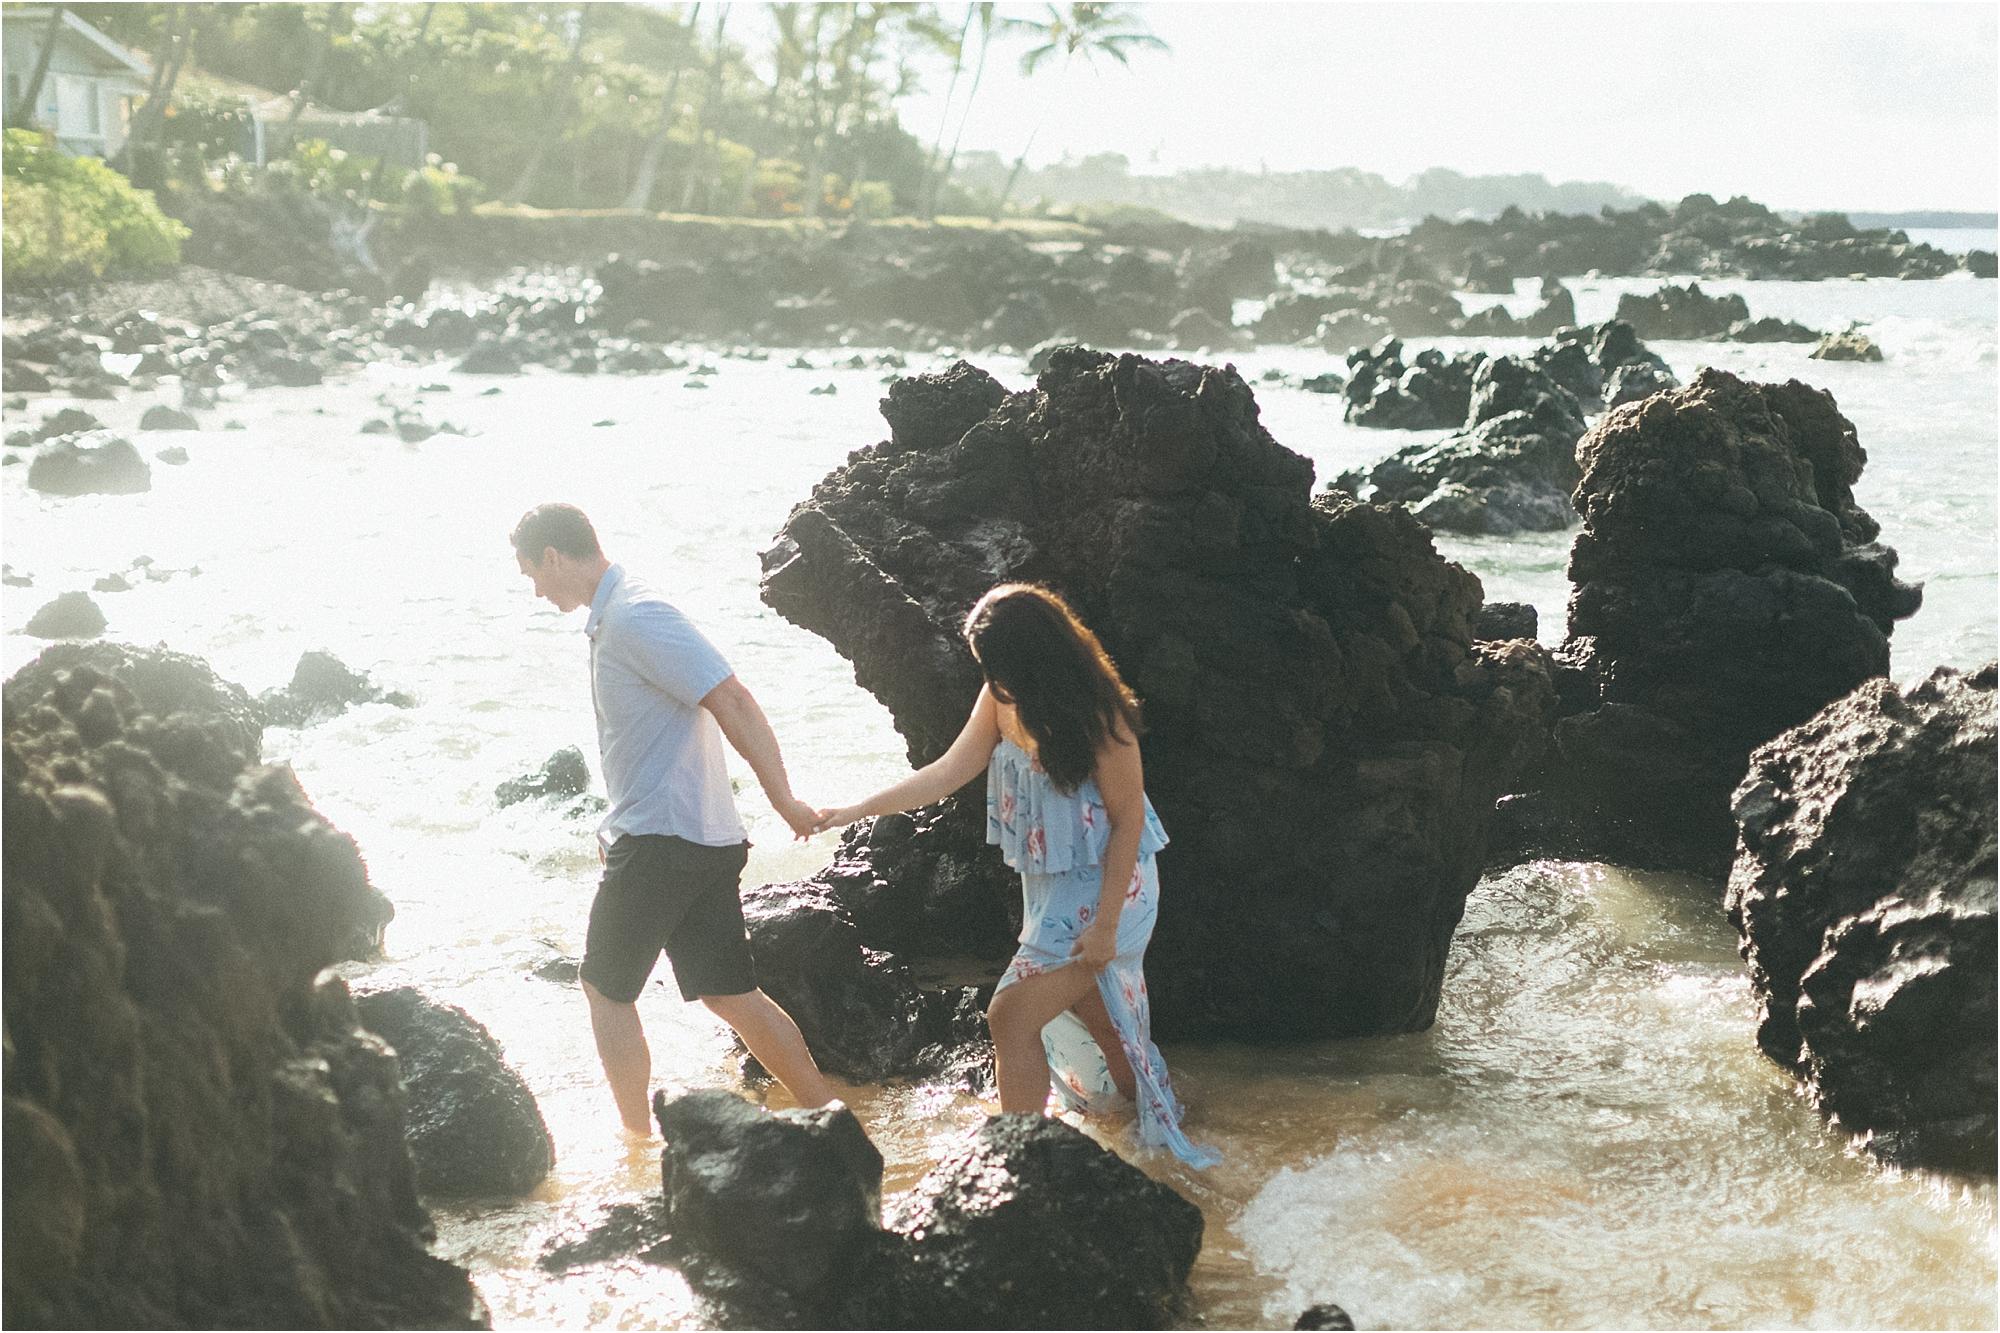 angie-diaz-photography-maui-hawaii-engagement-wedding-photographer_0008.jpg